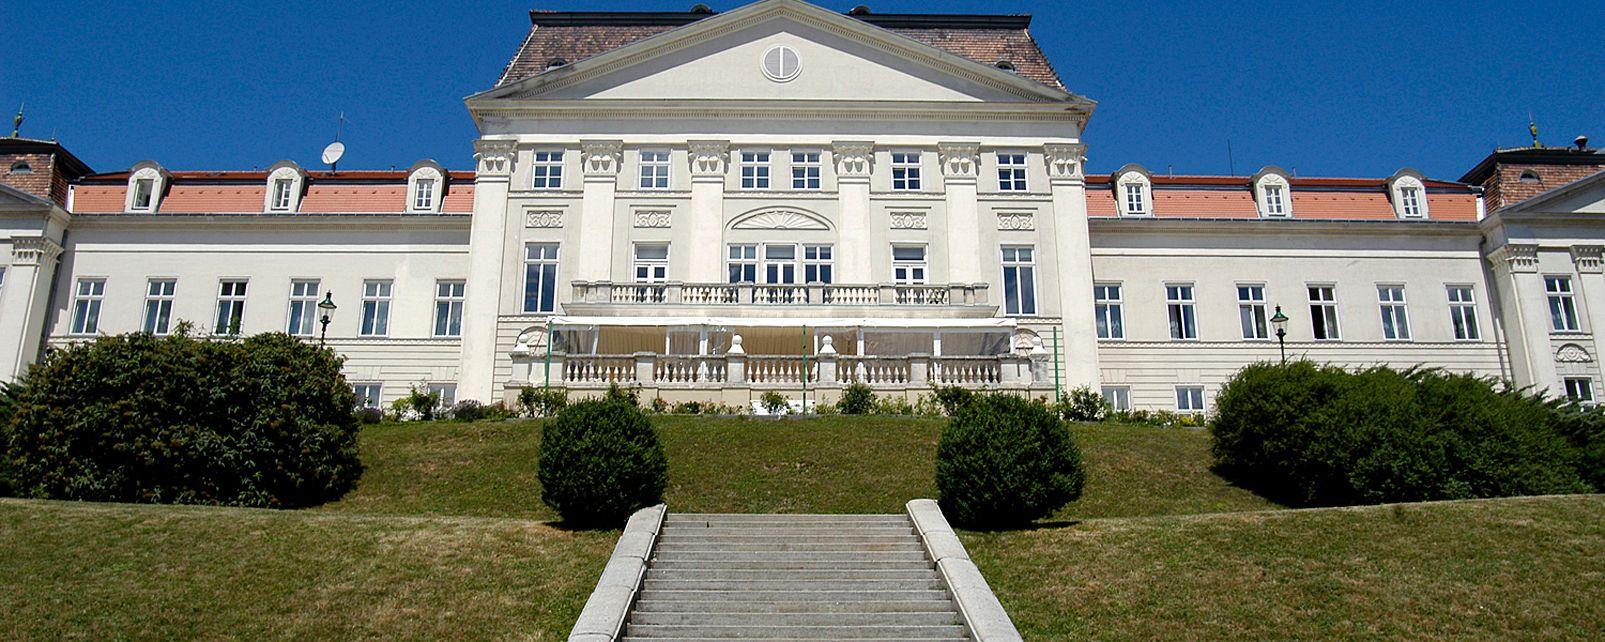 Hotel Schloss Wilhelminenberg